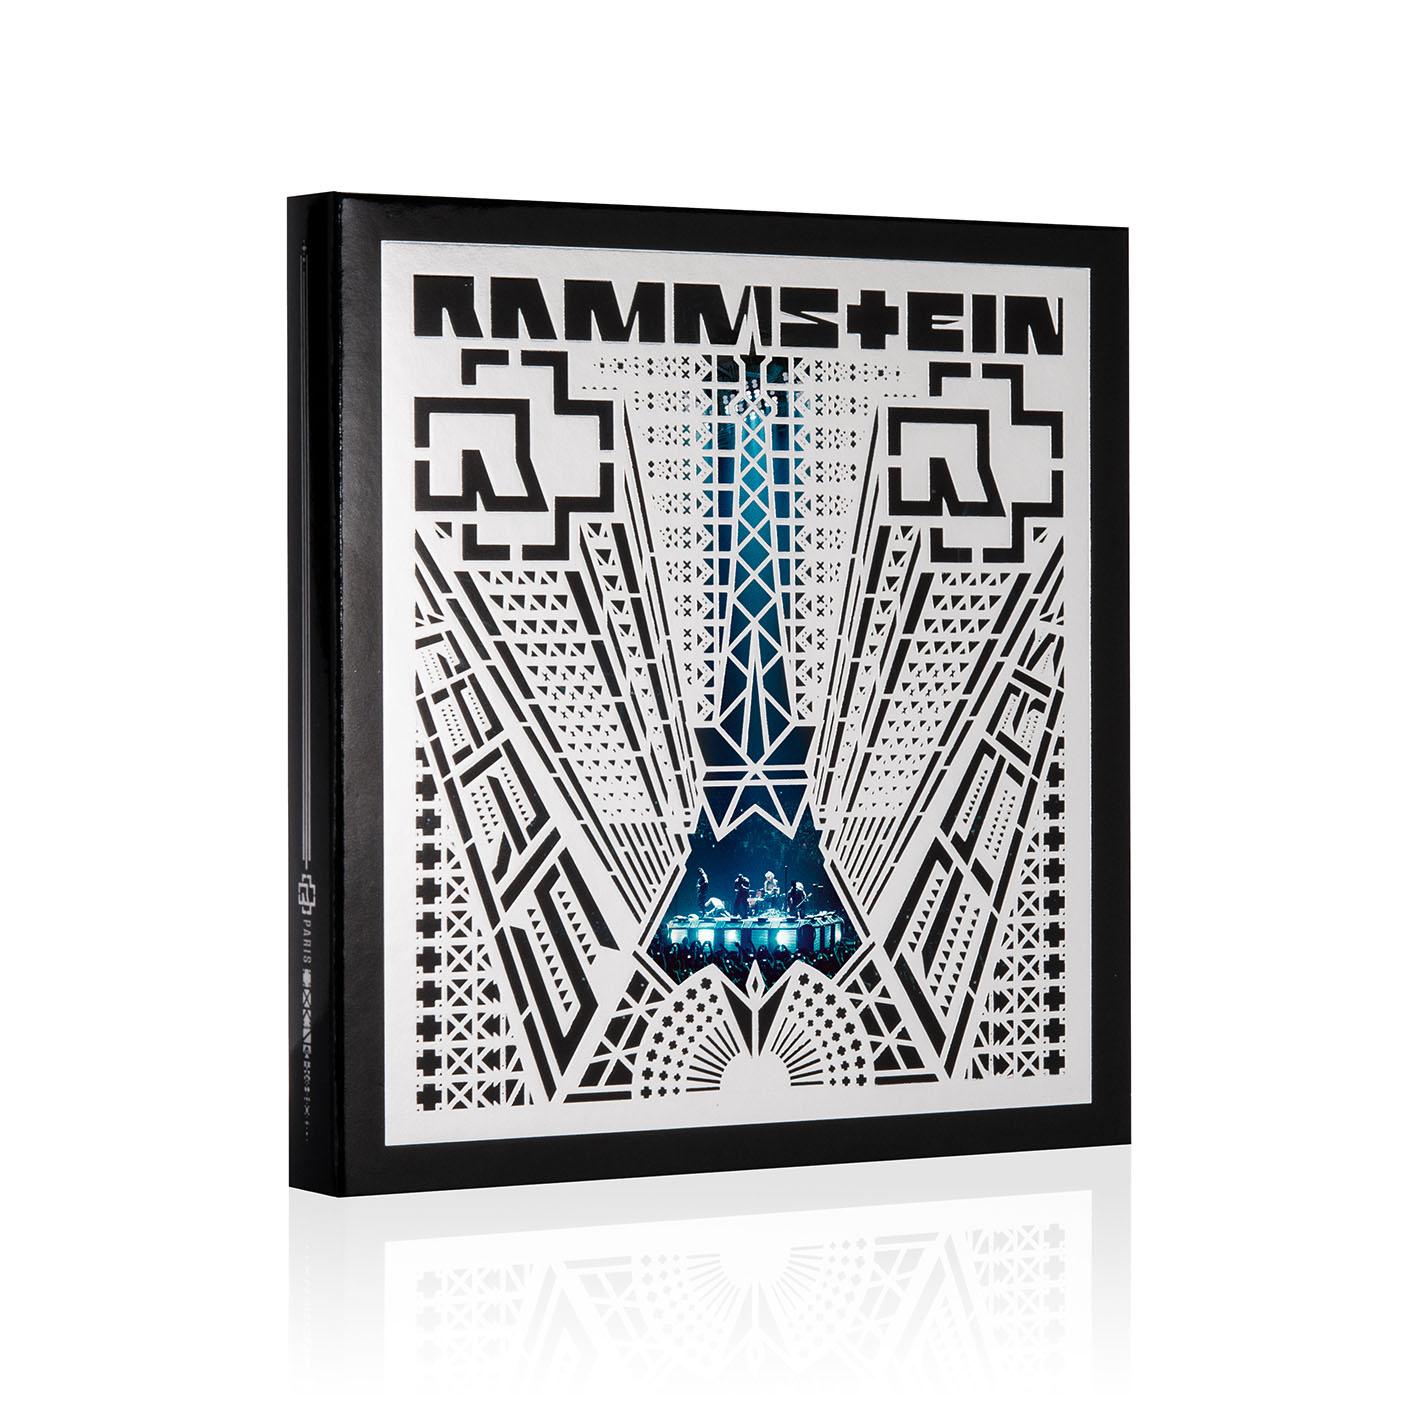 Rammstein Rammstein. Paris (2 CD) видео фильм как поймать живую куницу